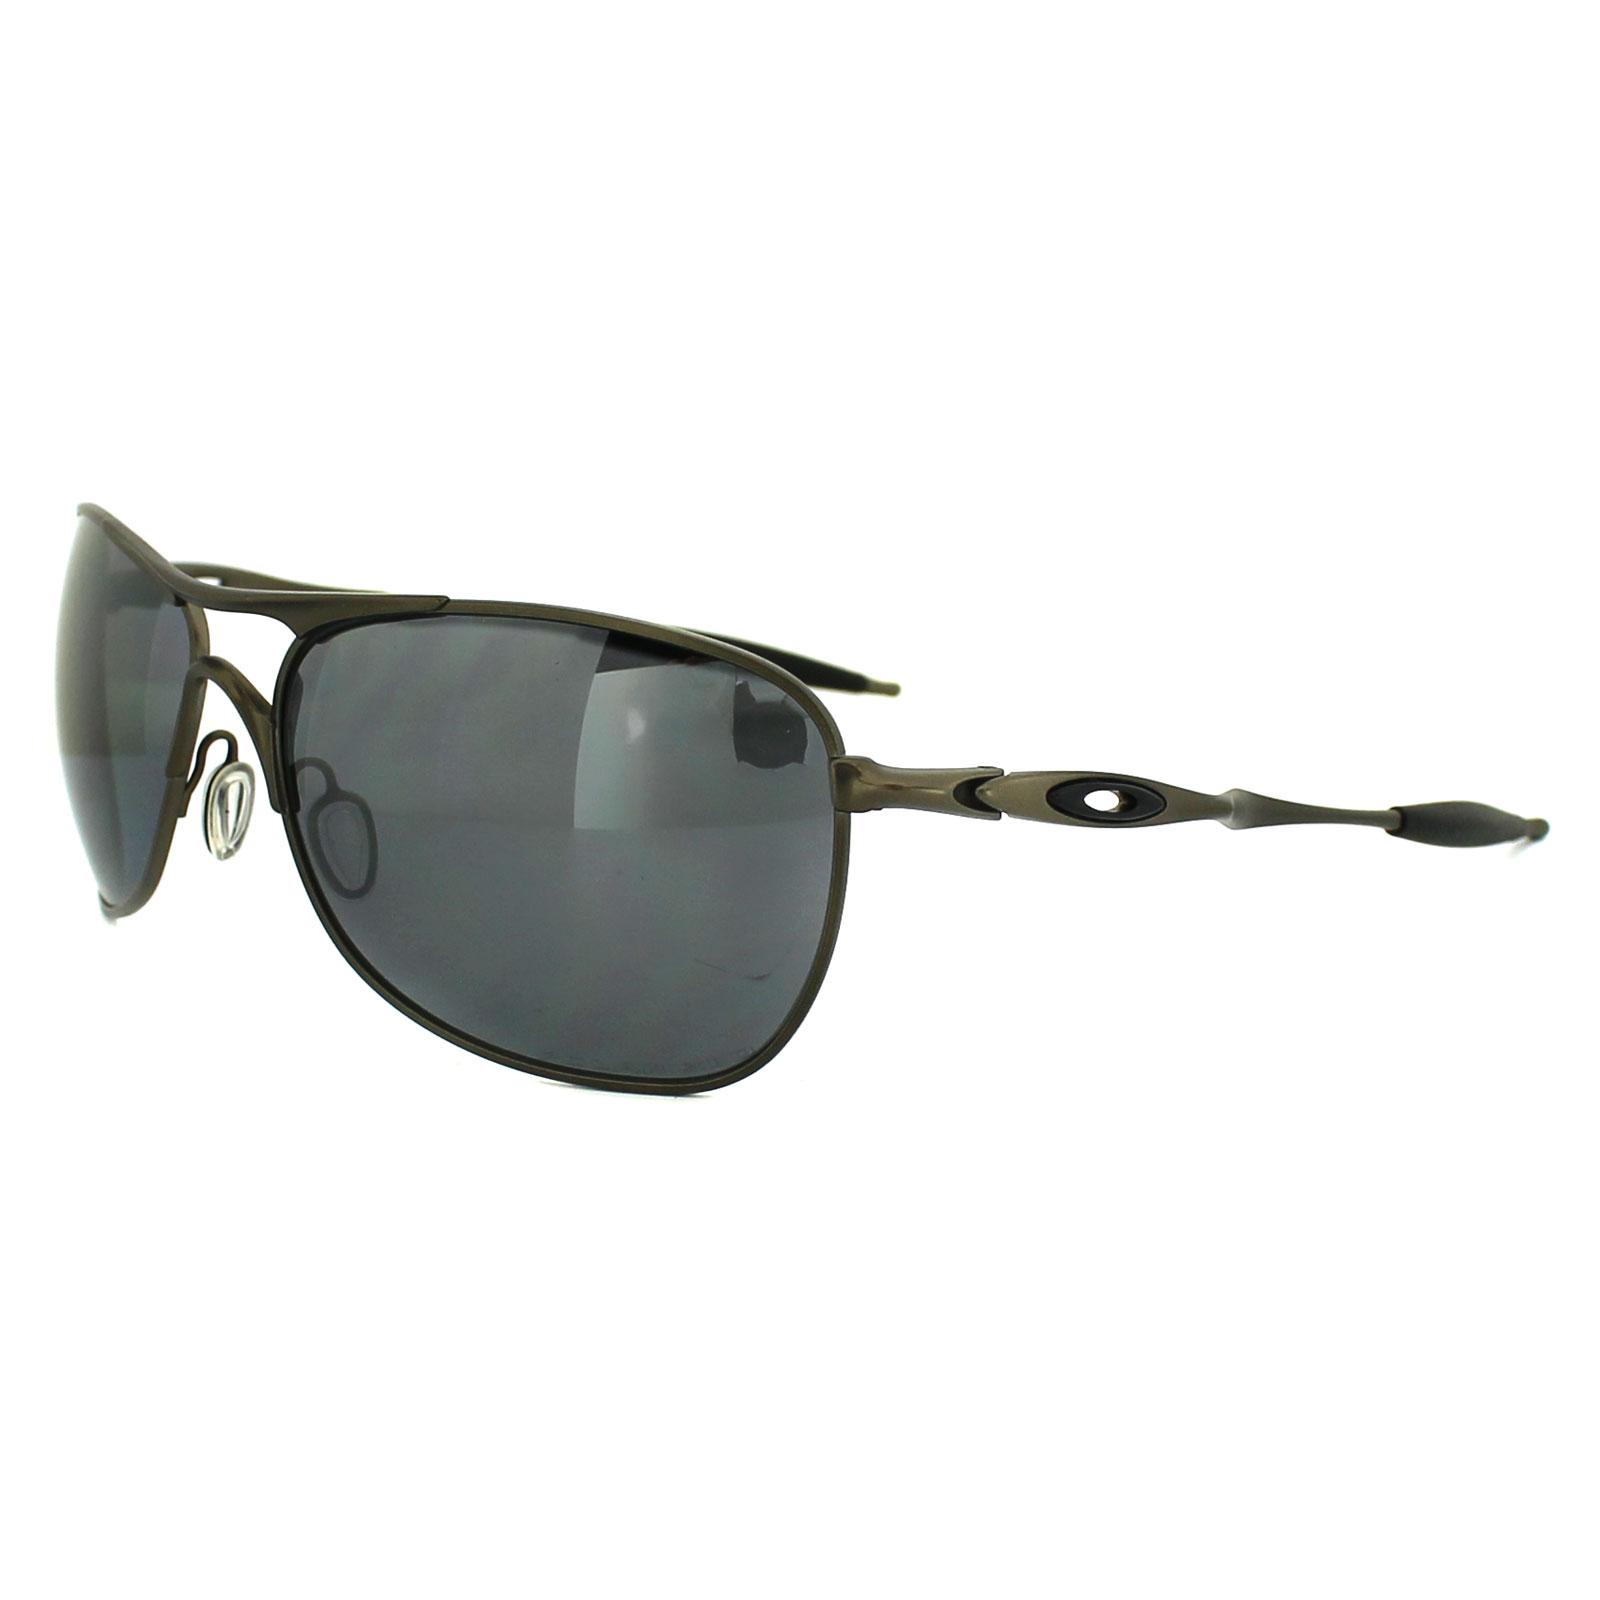 Oakley Ti Crosshair OO 6014 02 1 hzbX7Nb